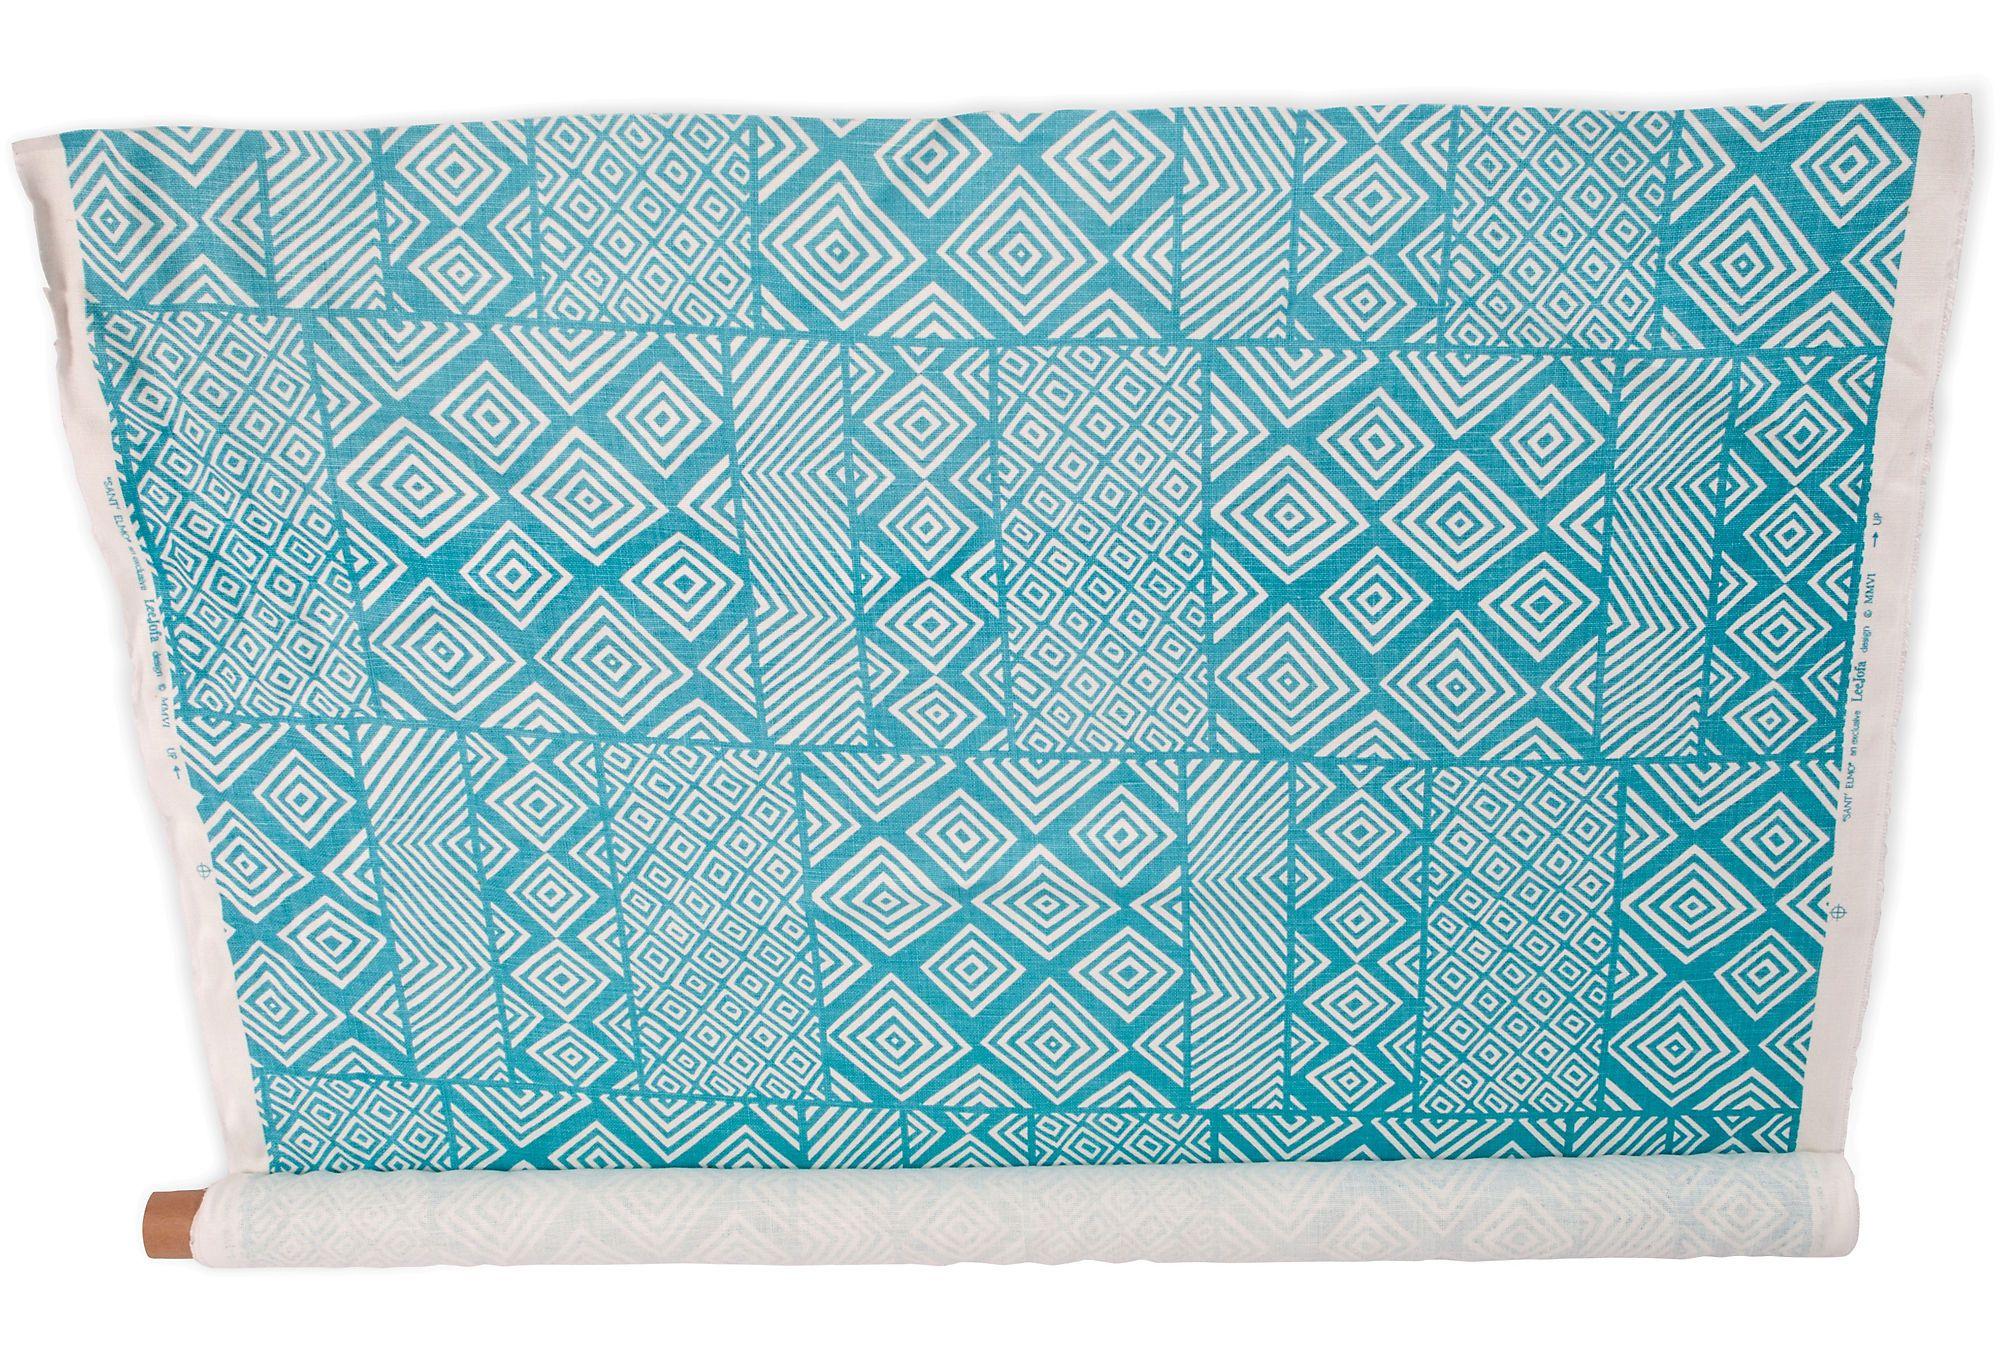 One Kings Lane - Kriste Michelini Interiors - Aztec Fabric, 3 Yards